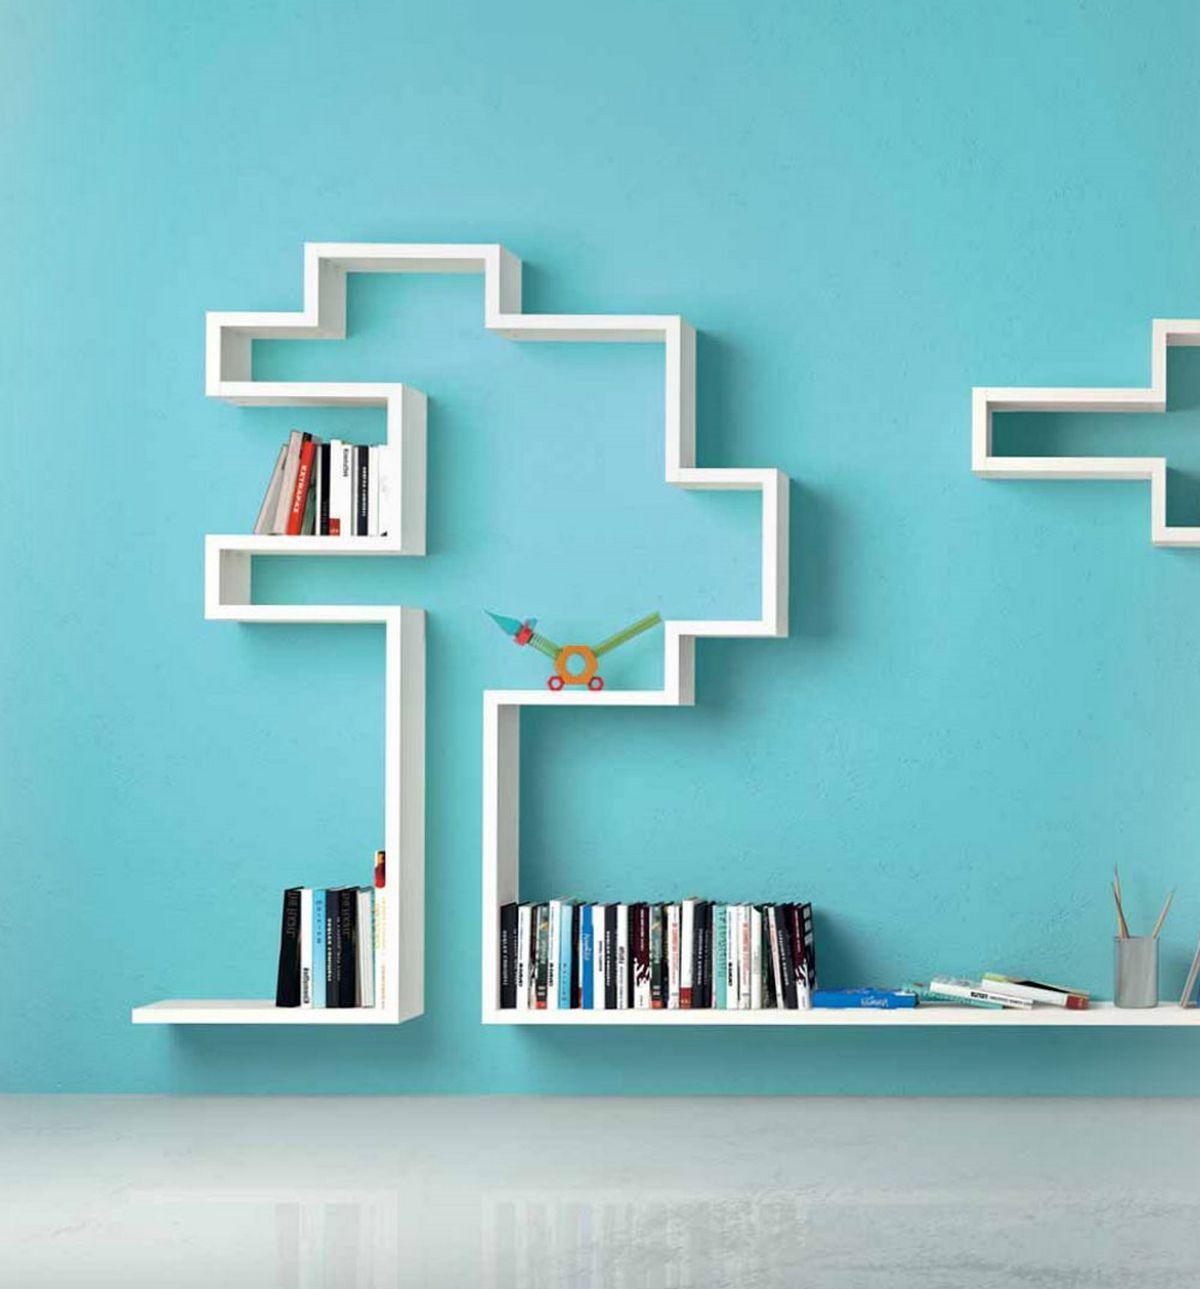 Lago Linea Modular Wall Shelving Innovative Design Wall Shelving